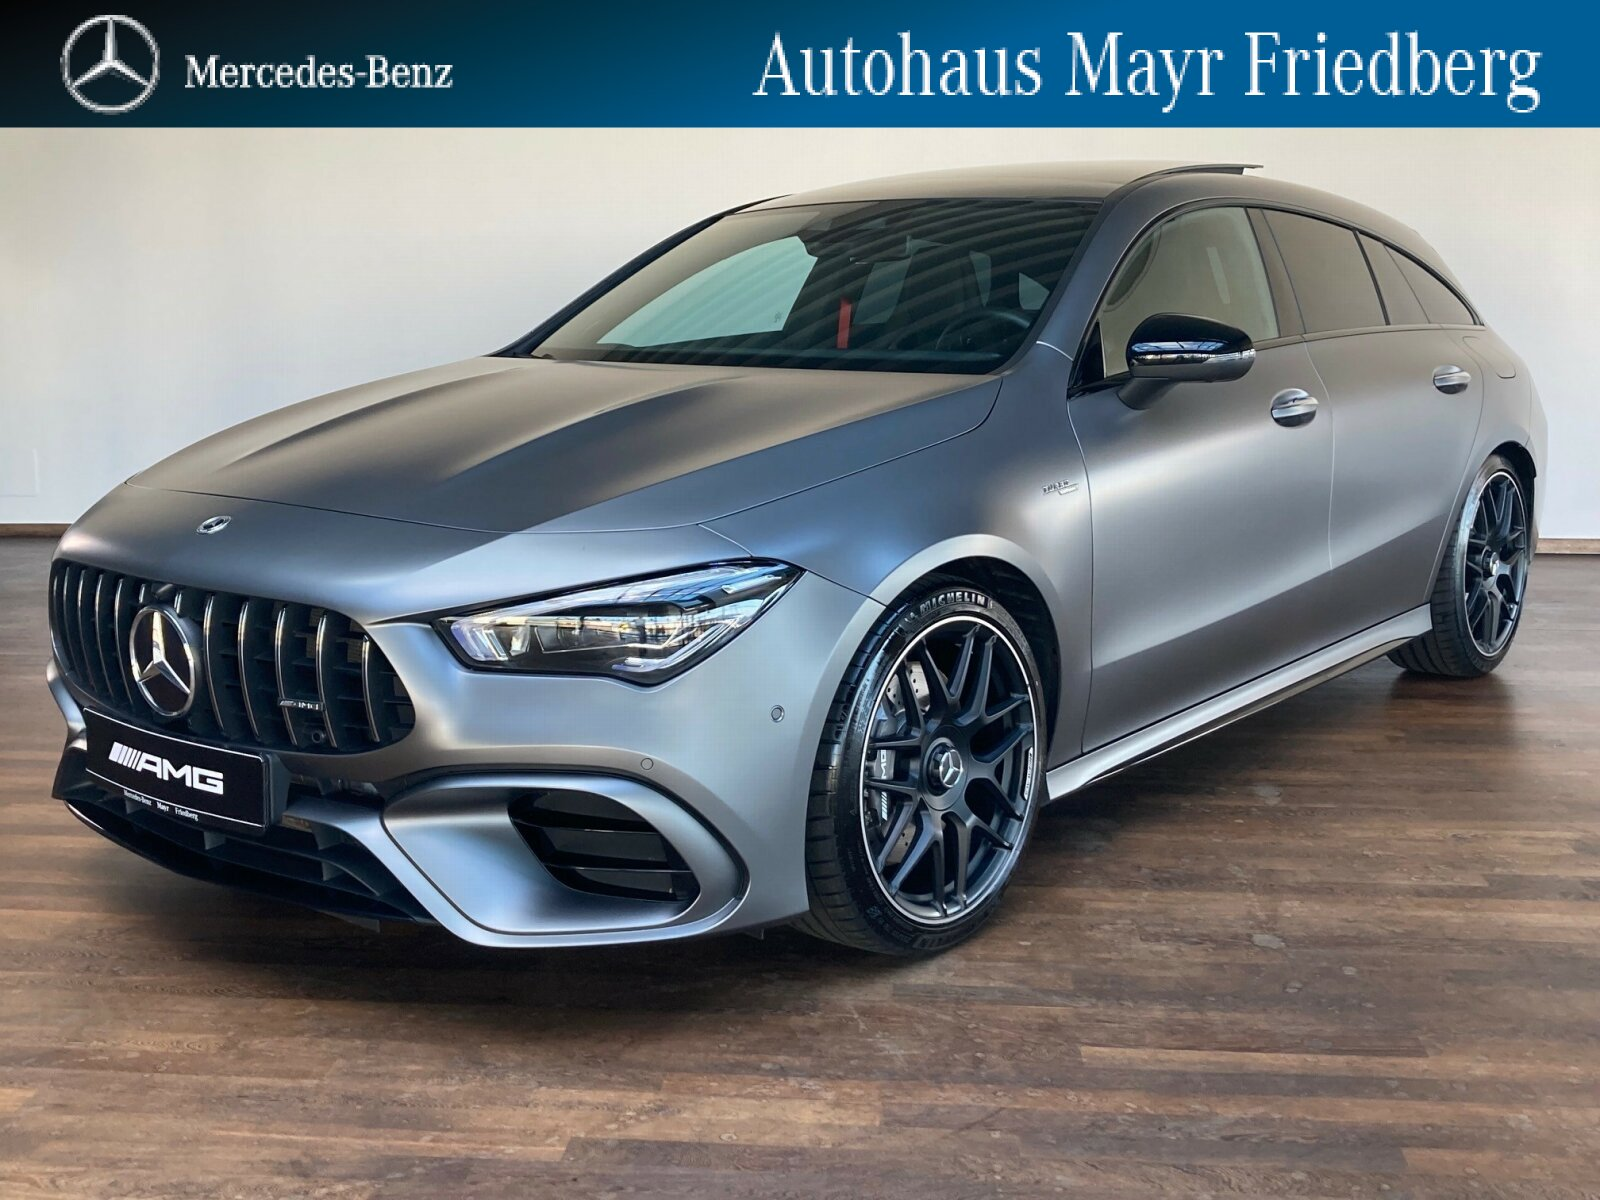 Mercedes-Benz CLA 45 4MATIC+ SB NIGHT+AHK+PANO-DACH+360°+MBUX, Jahr 2020, Benzin